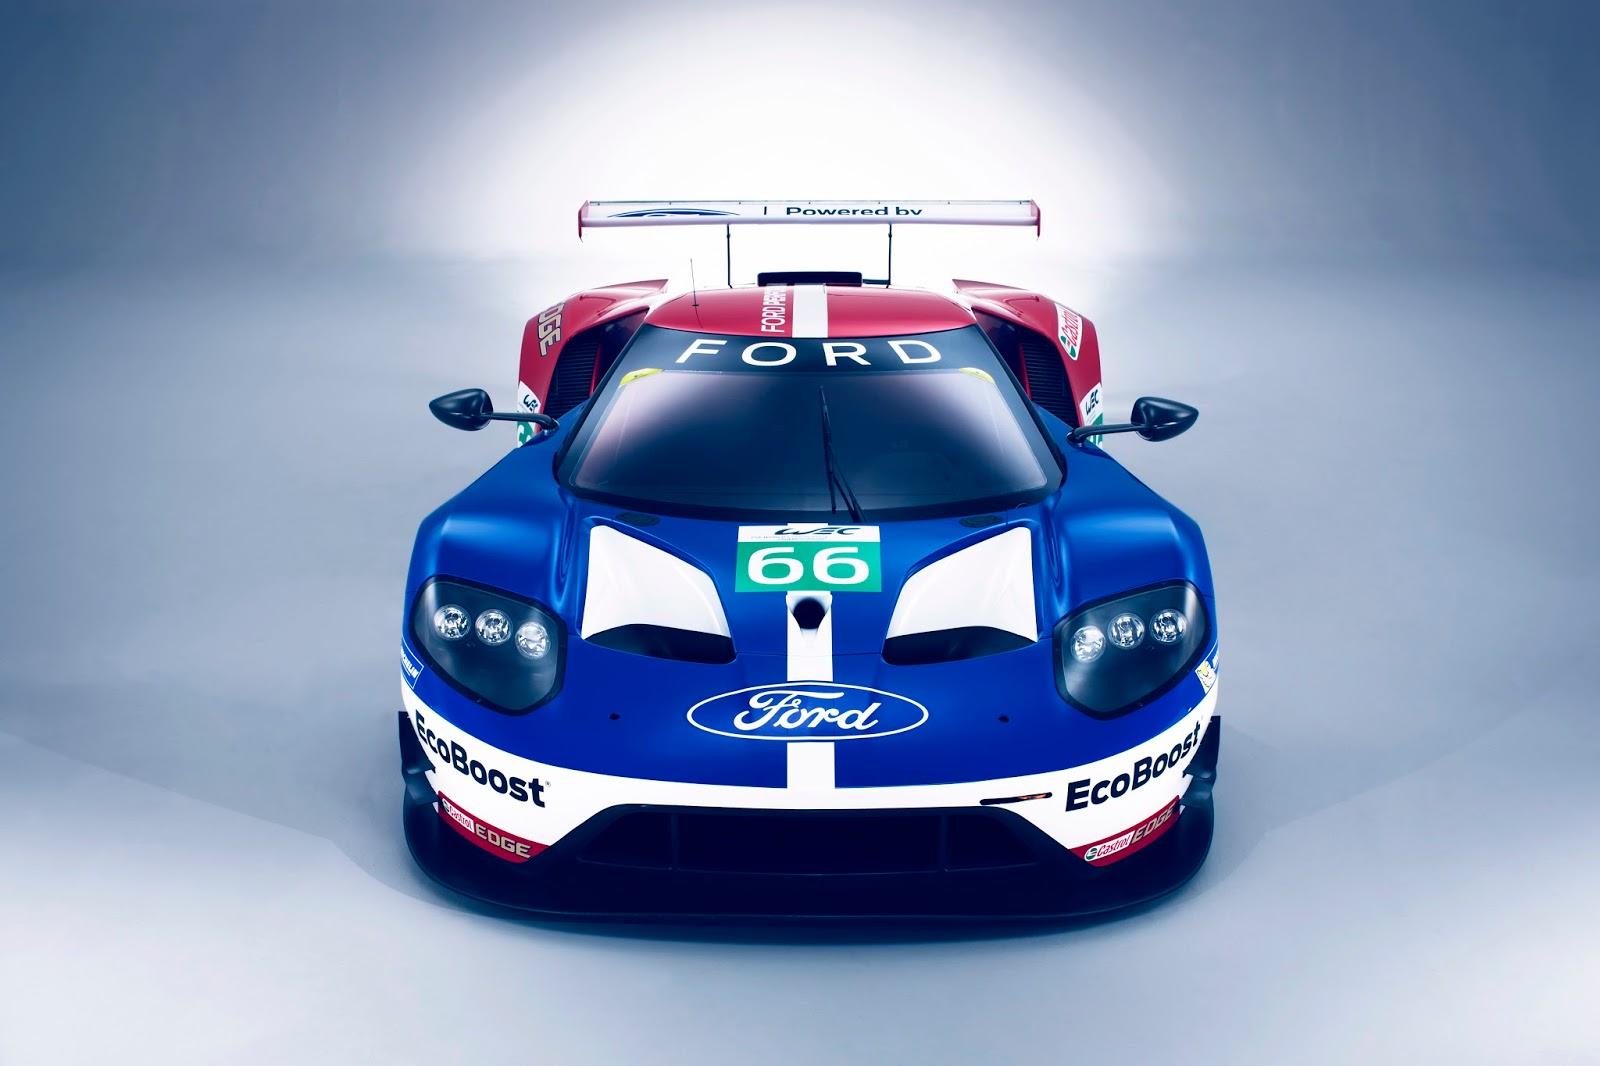 FordGT 2016 WEC head on%2B%25281%2529 Η Ford με το GT Race Car επιστρέφει στους αγώνες αντοχής και μας παρουσιάζει τους οδηγούς της Ford, Ford GT, World Endurance Championship